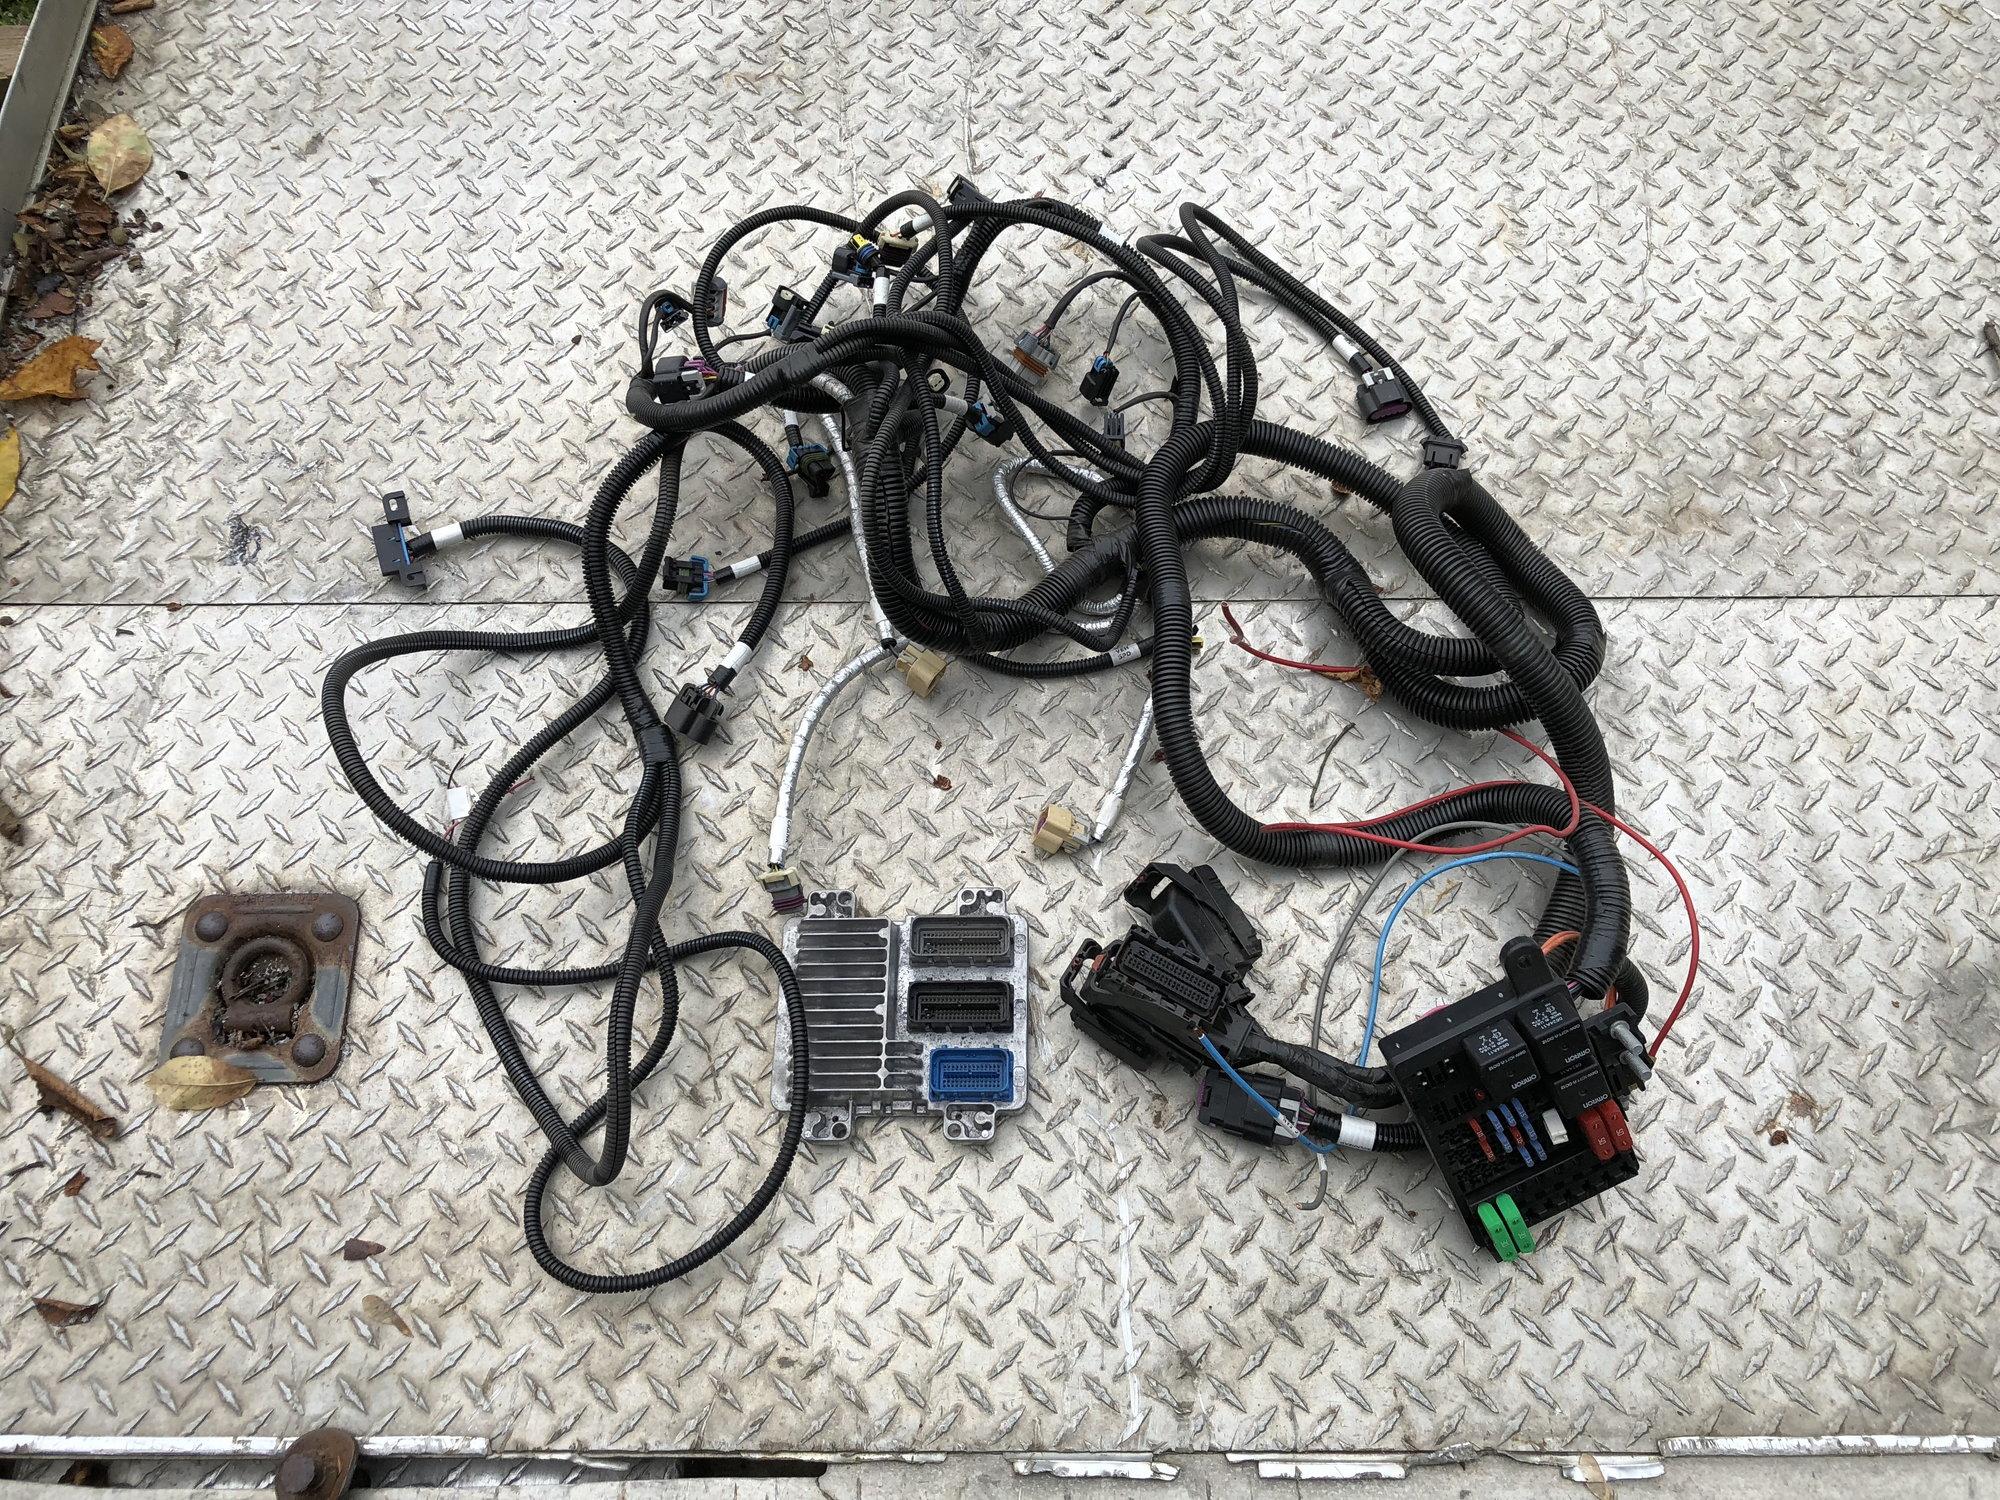 GMPP LS3/hotrod swap wiring harness & ECU on hot rod wiring harness, electrical wiring harness, spark plug wiring harness, engine swap voltage regulator, throttle body wiring harness, cruise control wiring harness, eg k-series harness, fuel pump wiring harness, transfer case wiring harness, jeep wiring harness, 94 silverado engine wire harness, silverado dash wiring harness, t-bucket wiring harness, ls1 engine swap harness, s14 1jz wiring harness, cooling fan wiring harness, cressida 1jz wiring harness, toyota wiring harness, ignition switch wiring harness,